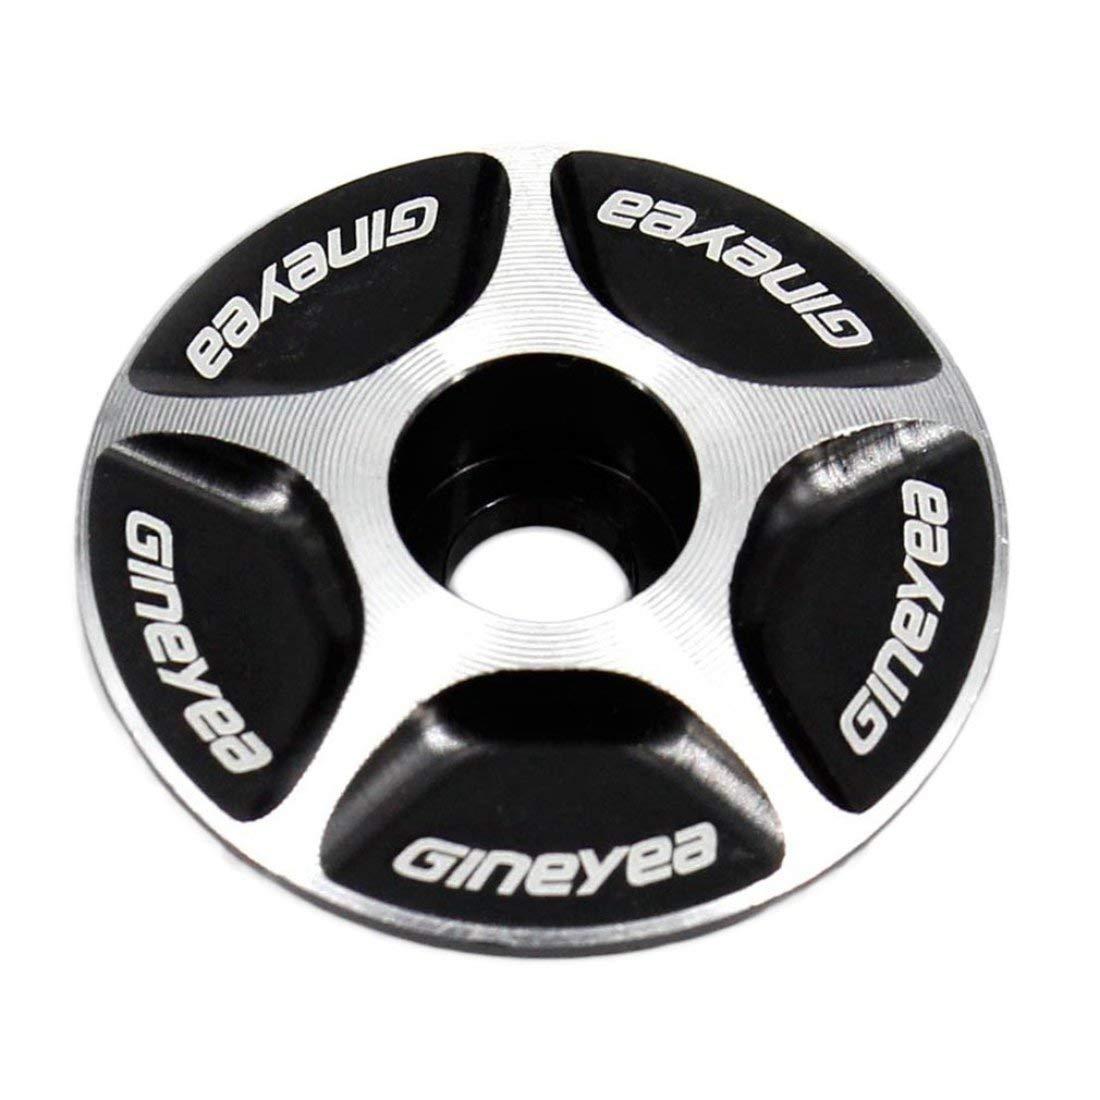 Formulaone Aluminio Threadless 1//1-1//8 Road MTB Bike Stem Accesorios Bici Bicycle Cycling Headset Tapa Superior Marca Marca